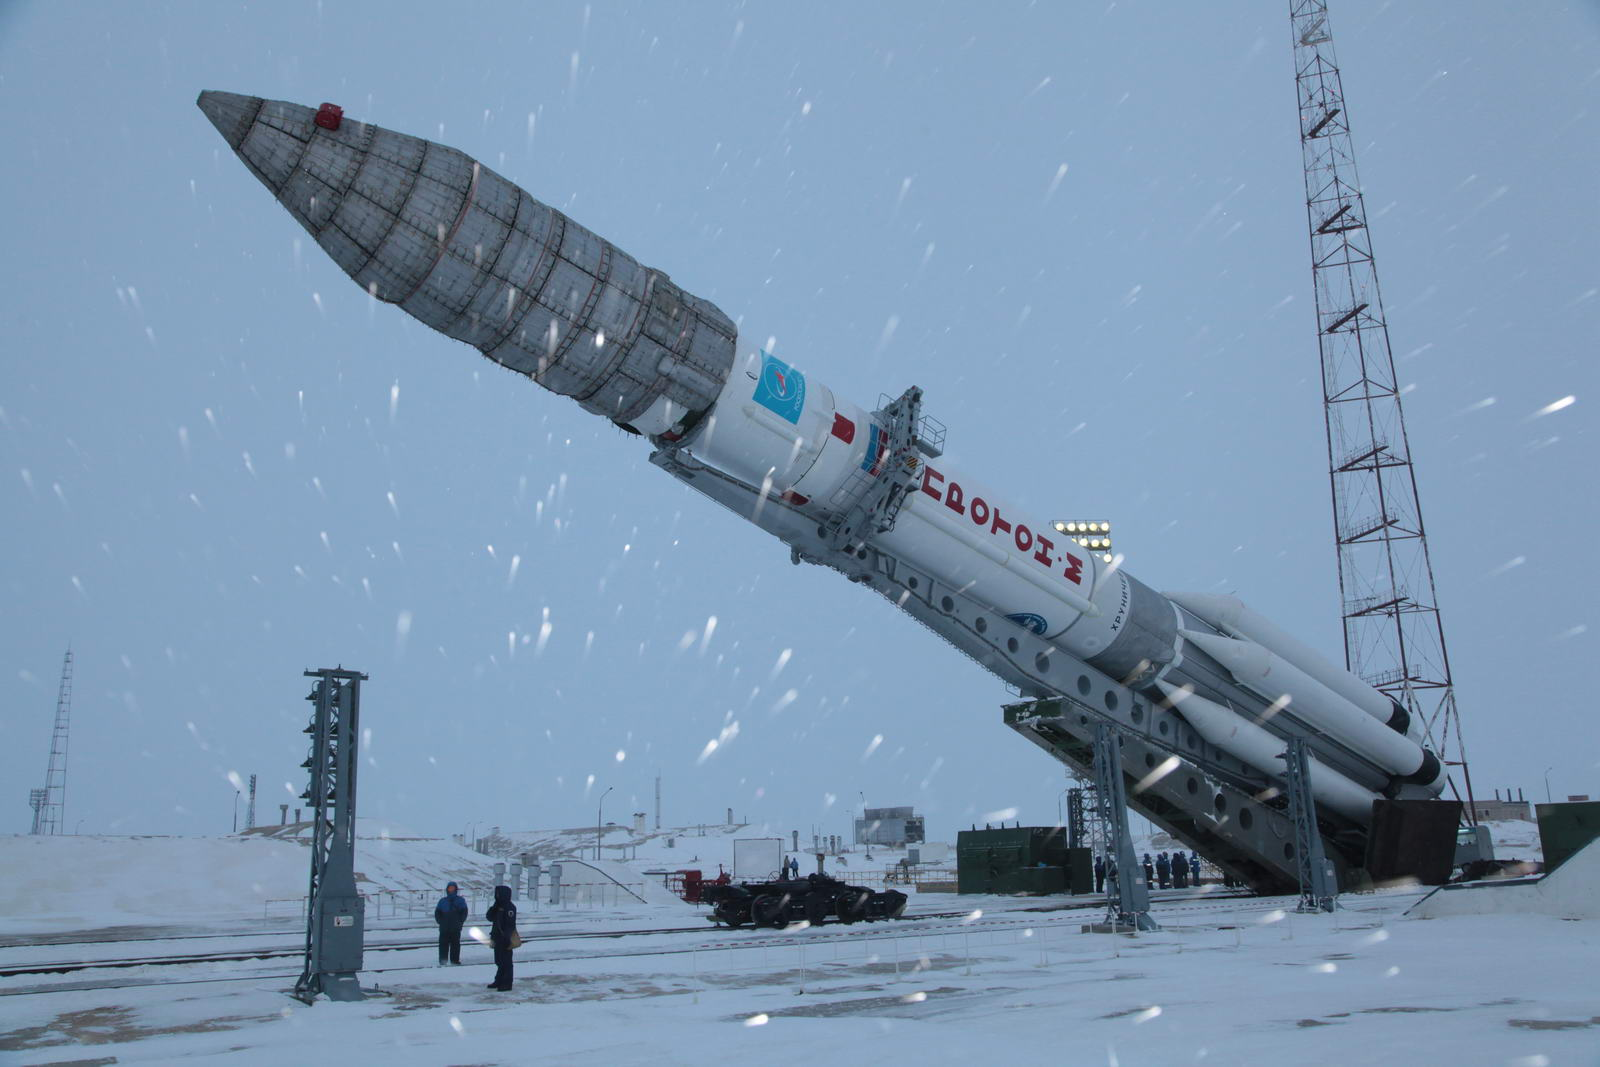 Proton rocket Roscosmos snow